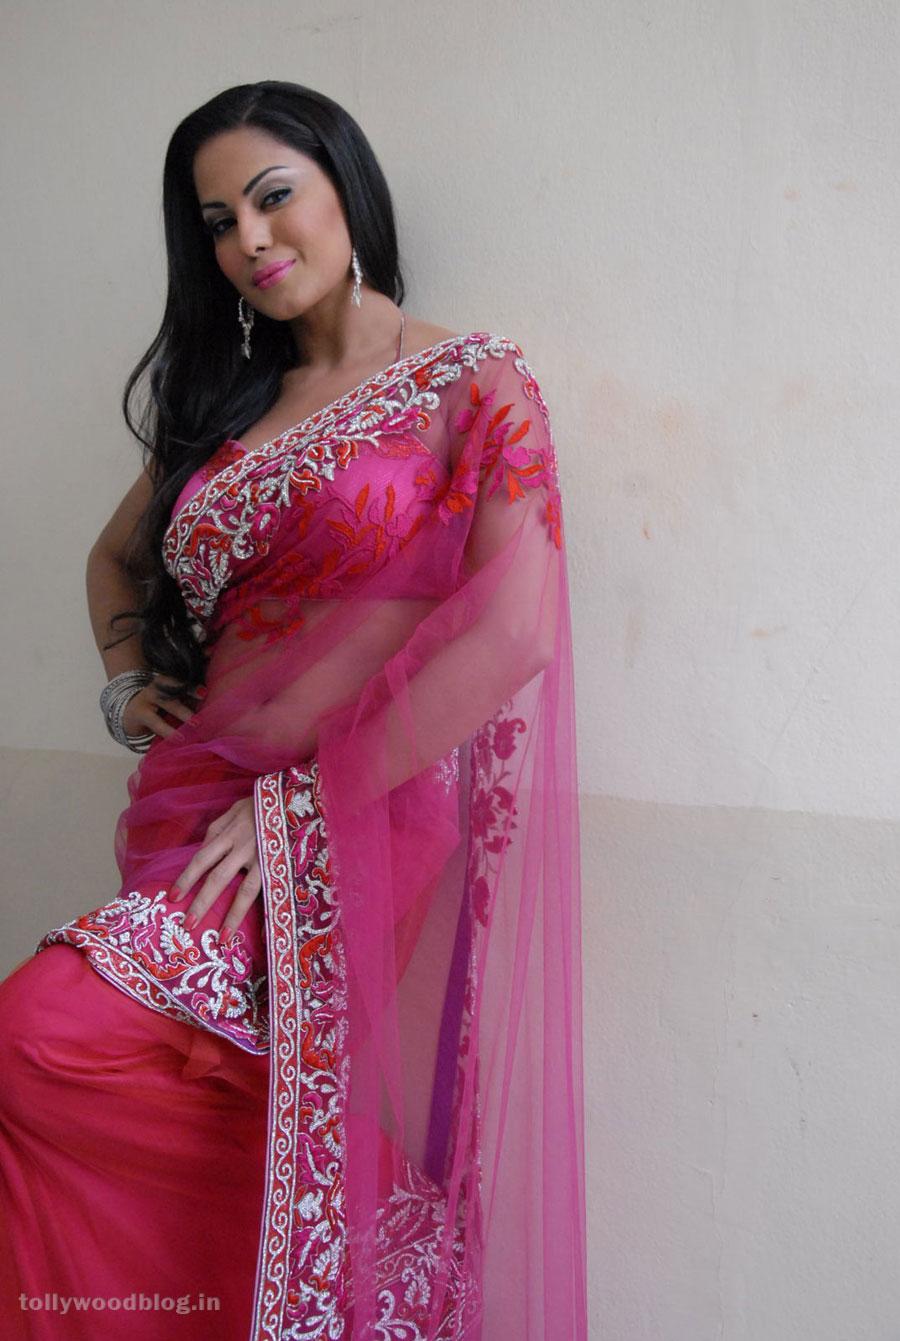 Alphabet U Wallpapers 3d Veena Malik Latest Hot Photos Gallery Telugu Hot